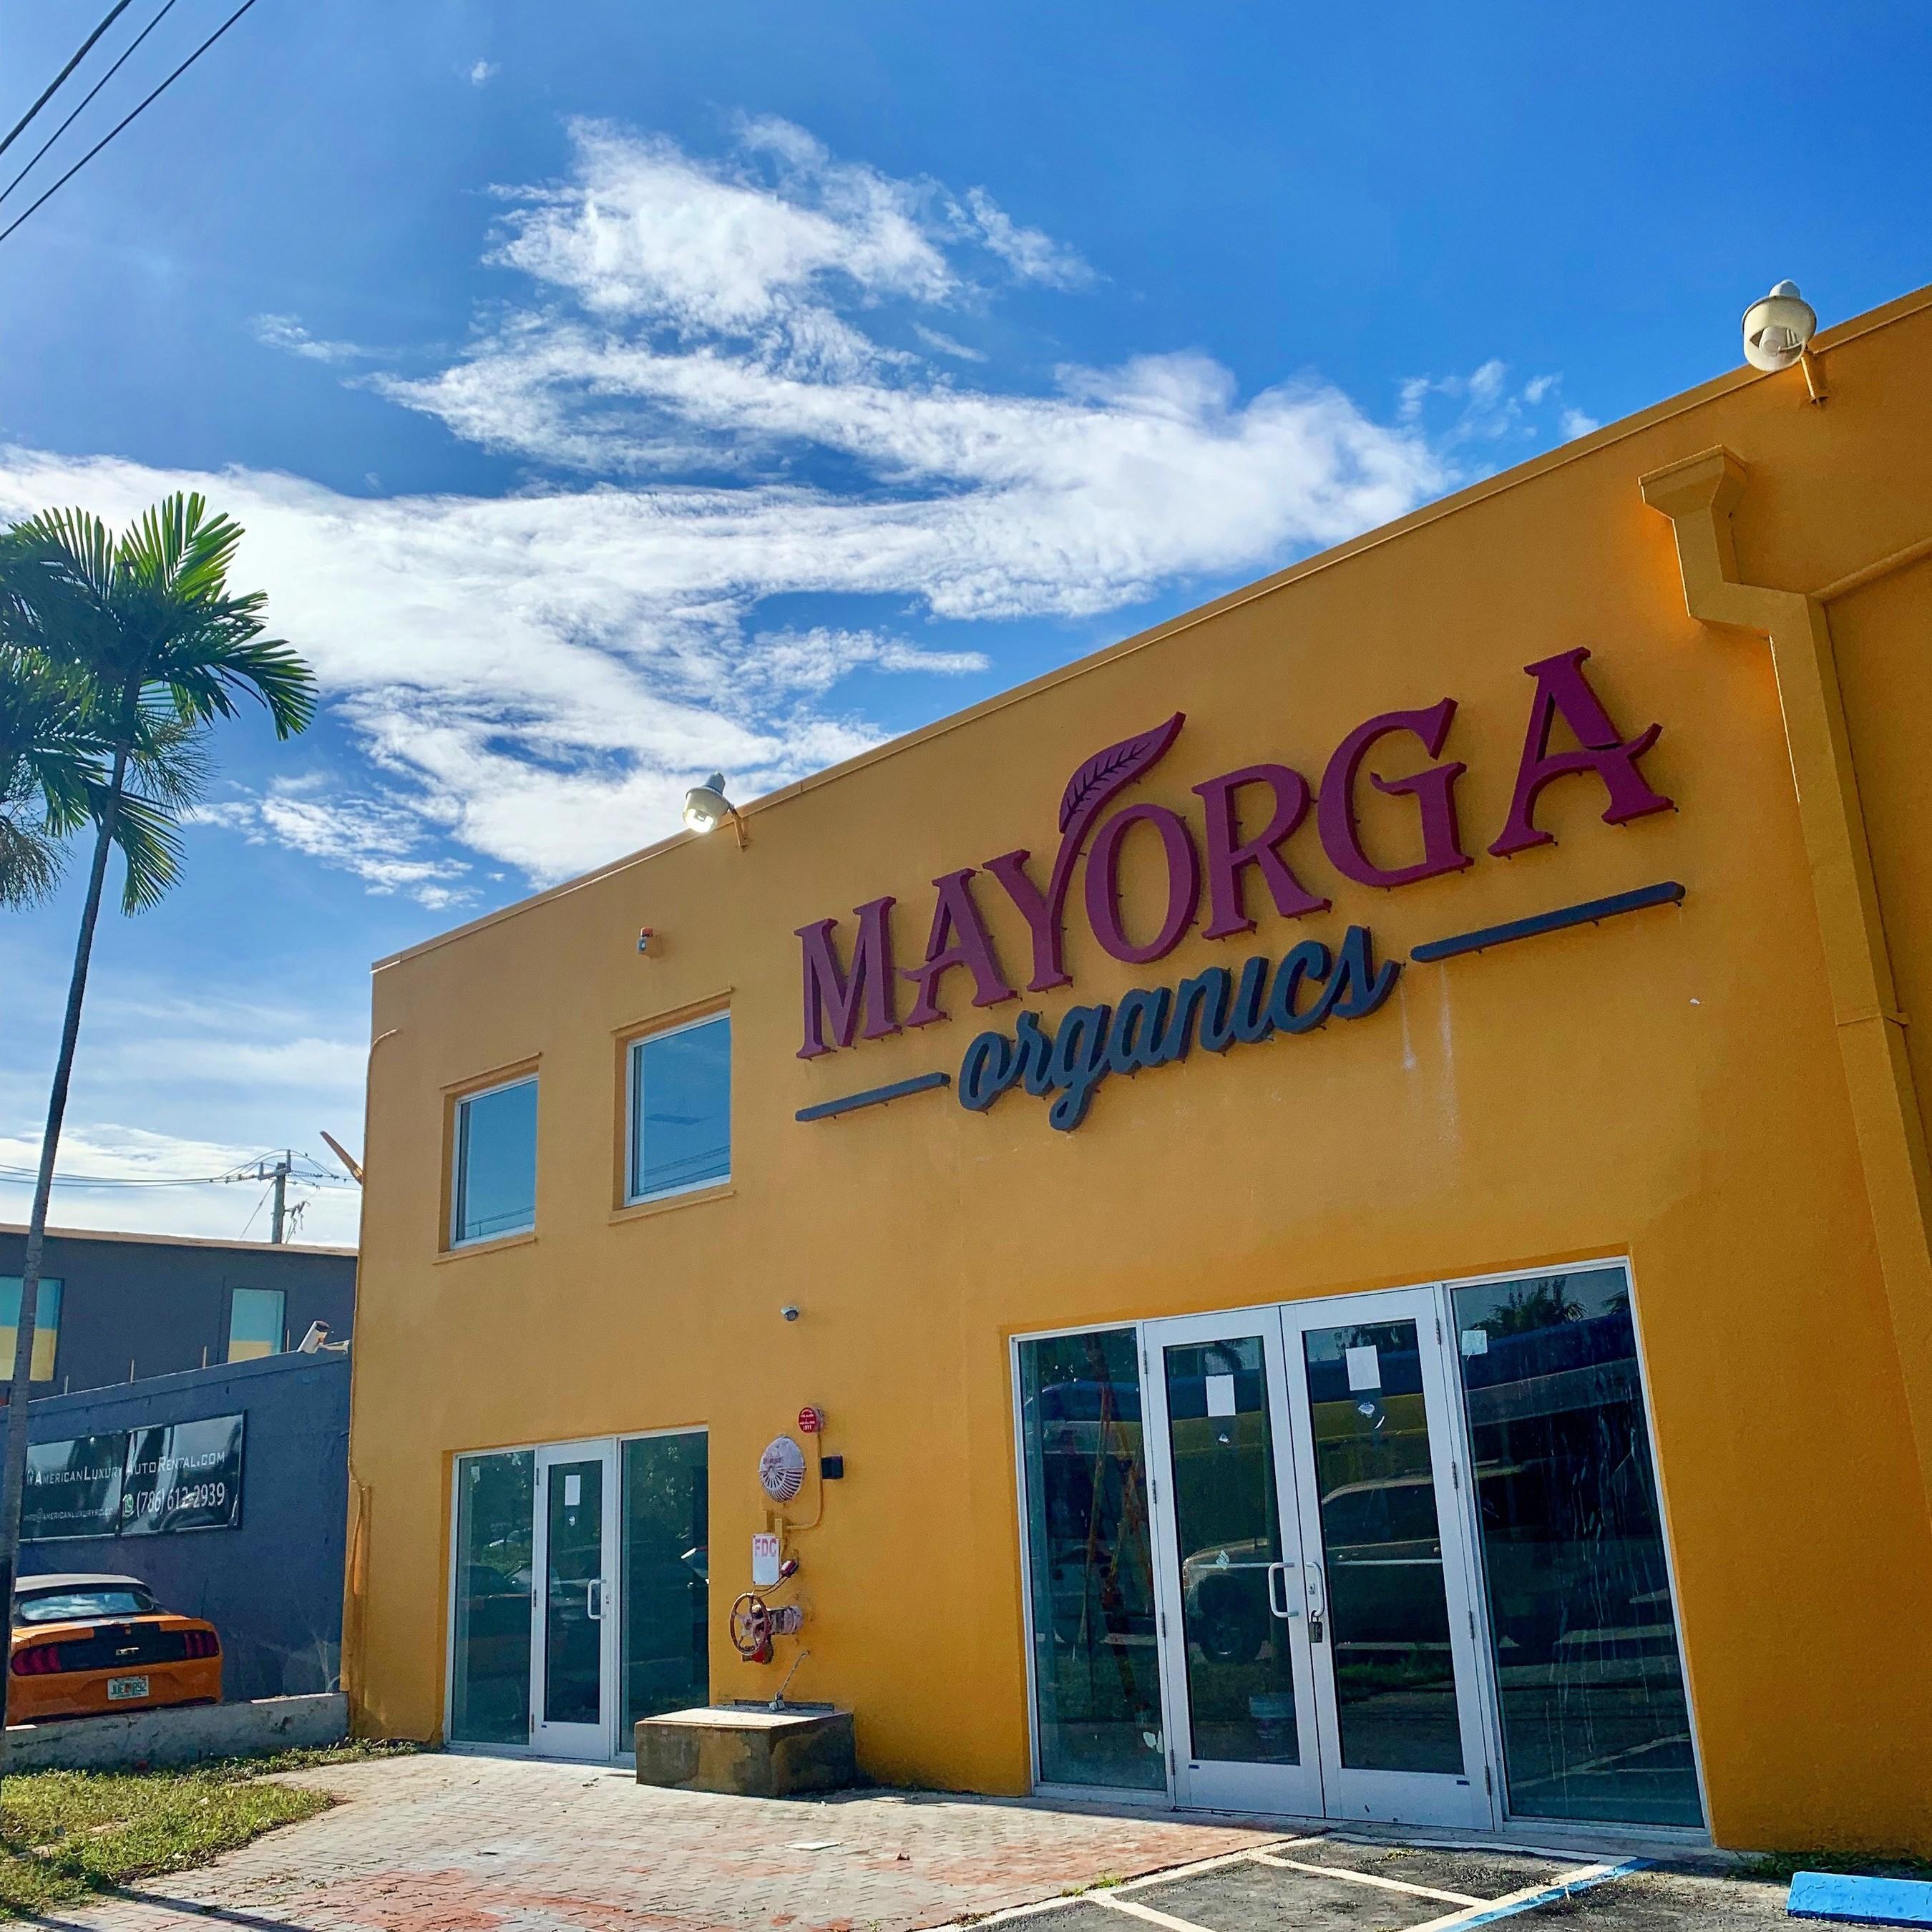 Mayorga Organics to Open New Coffee Factory in Miami